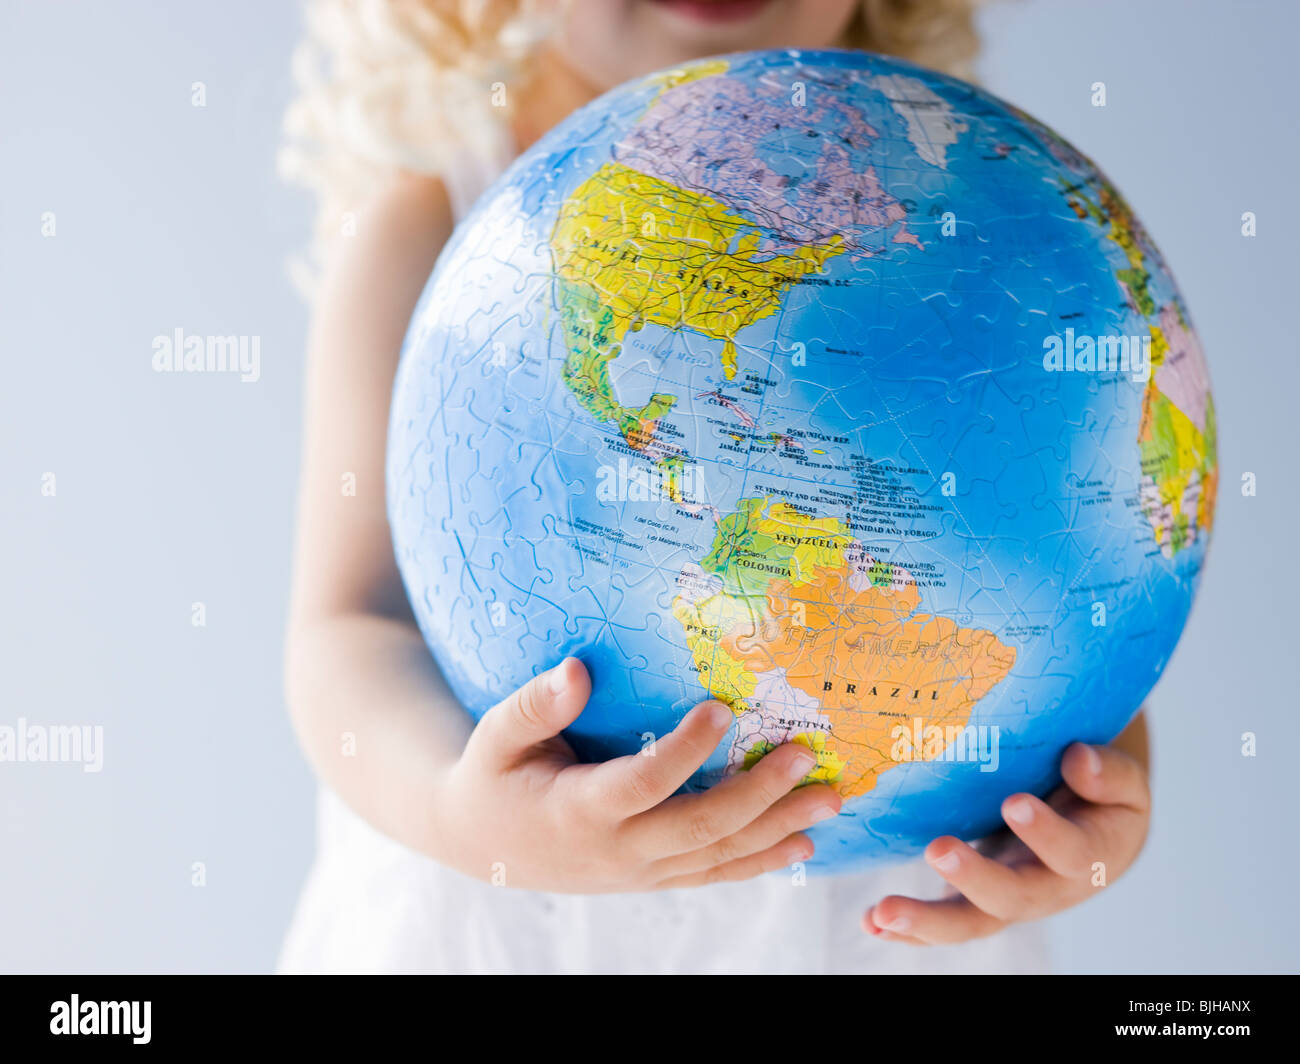 Little girl holding a globe Photo Stock